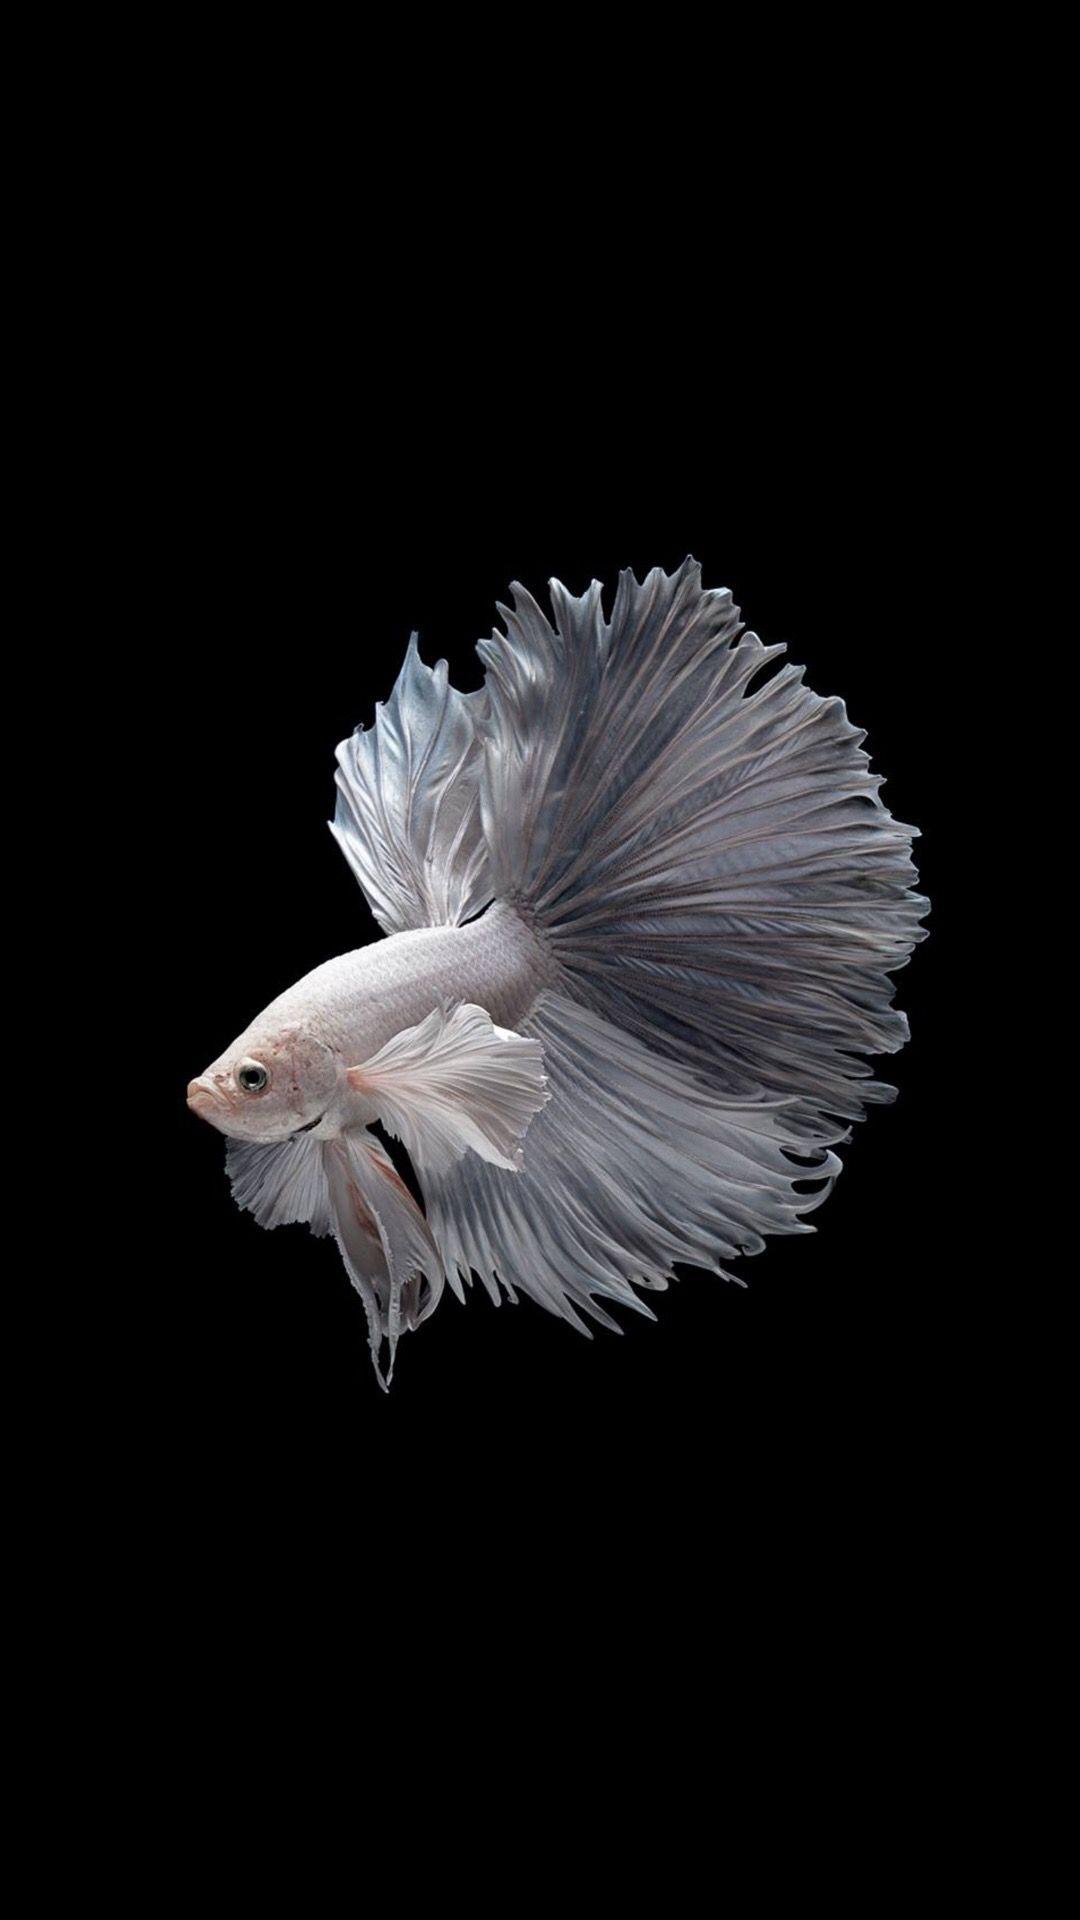 Pin oleh tracy brinkley di fish marine creatures for Immagini hd per smartphone